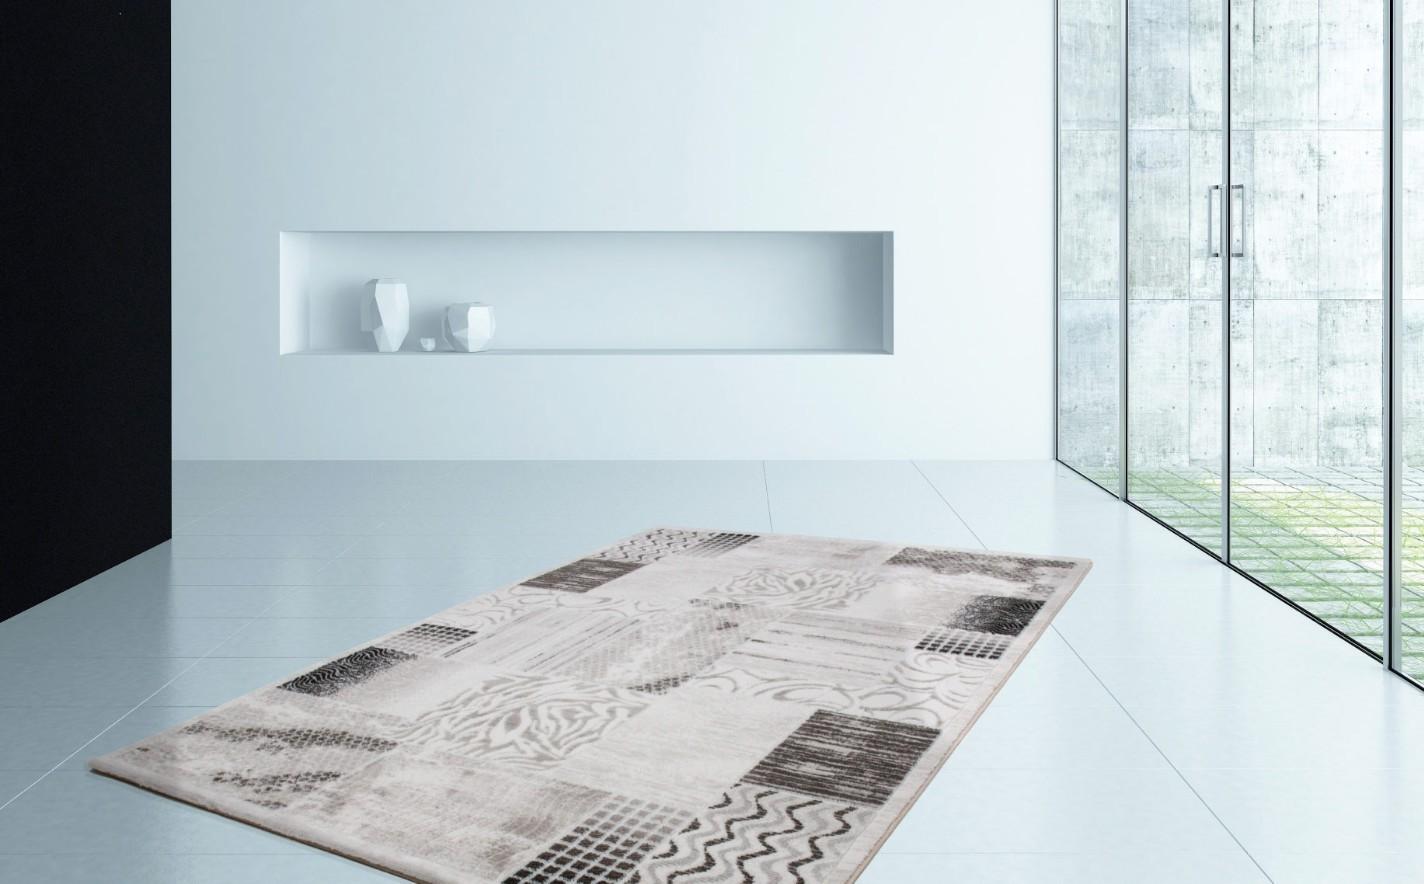 Tapis gris noir design contemporain firenze pas cher for Tapis contemporain design